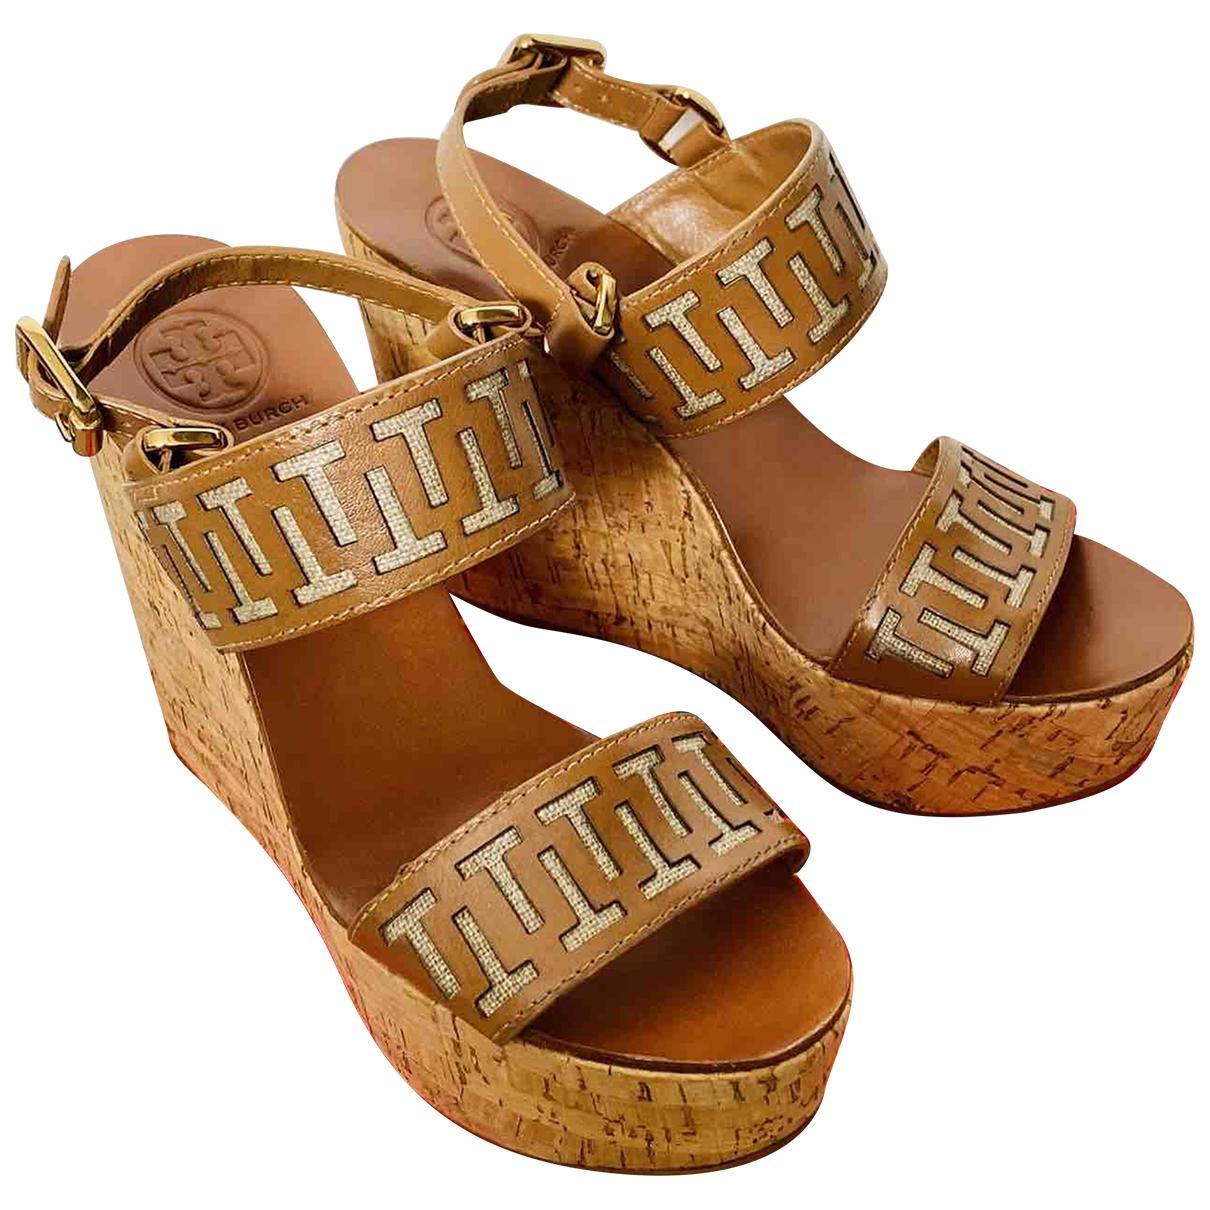 Tory Burch \N Beige Leather Sandals for Women 39.5 EU